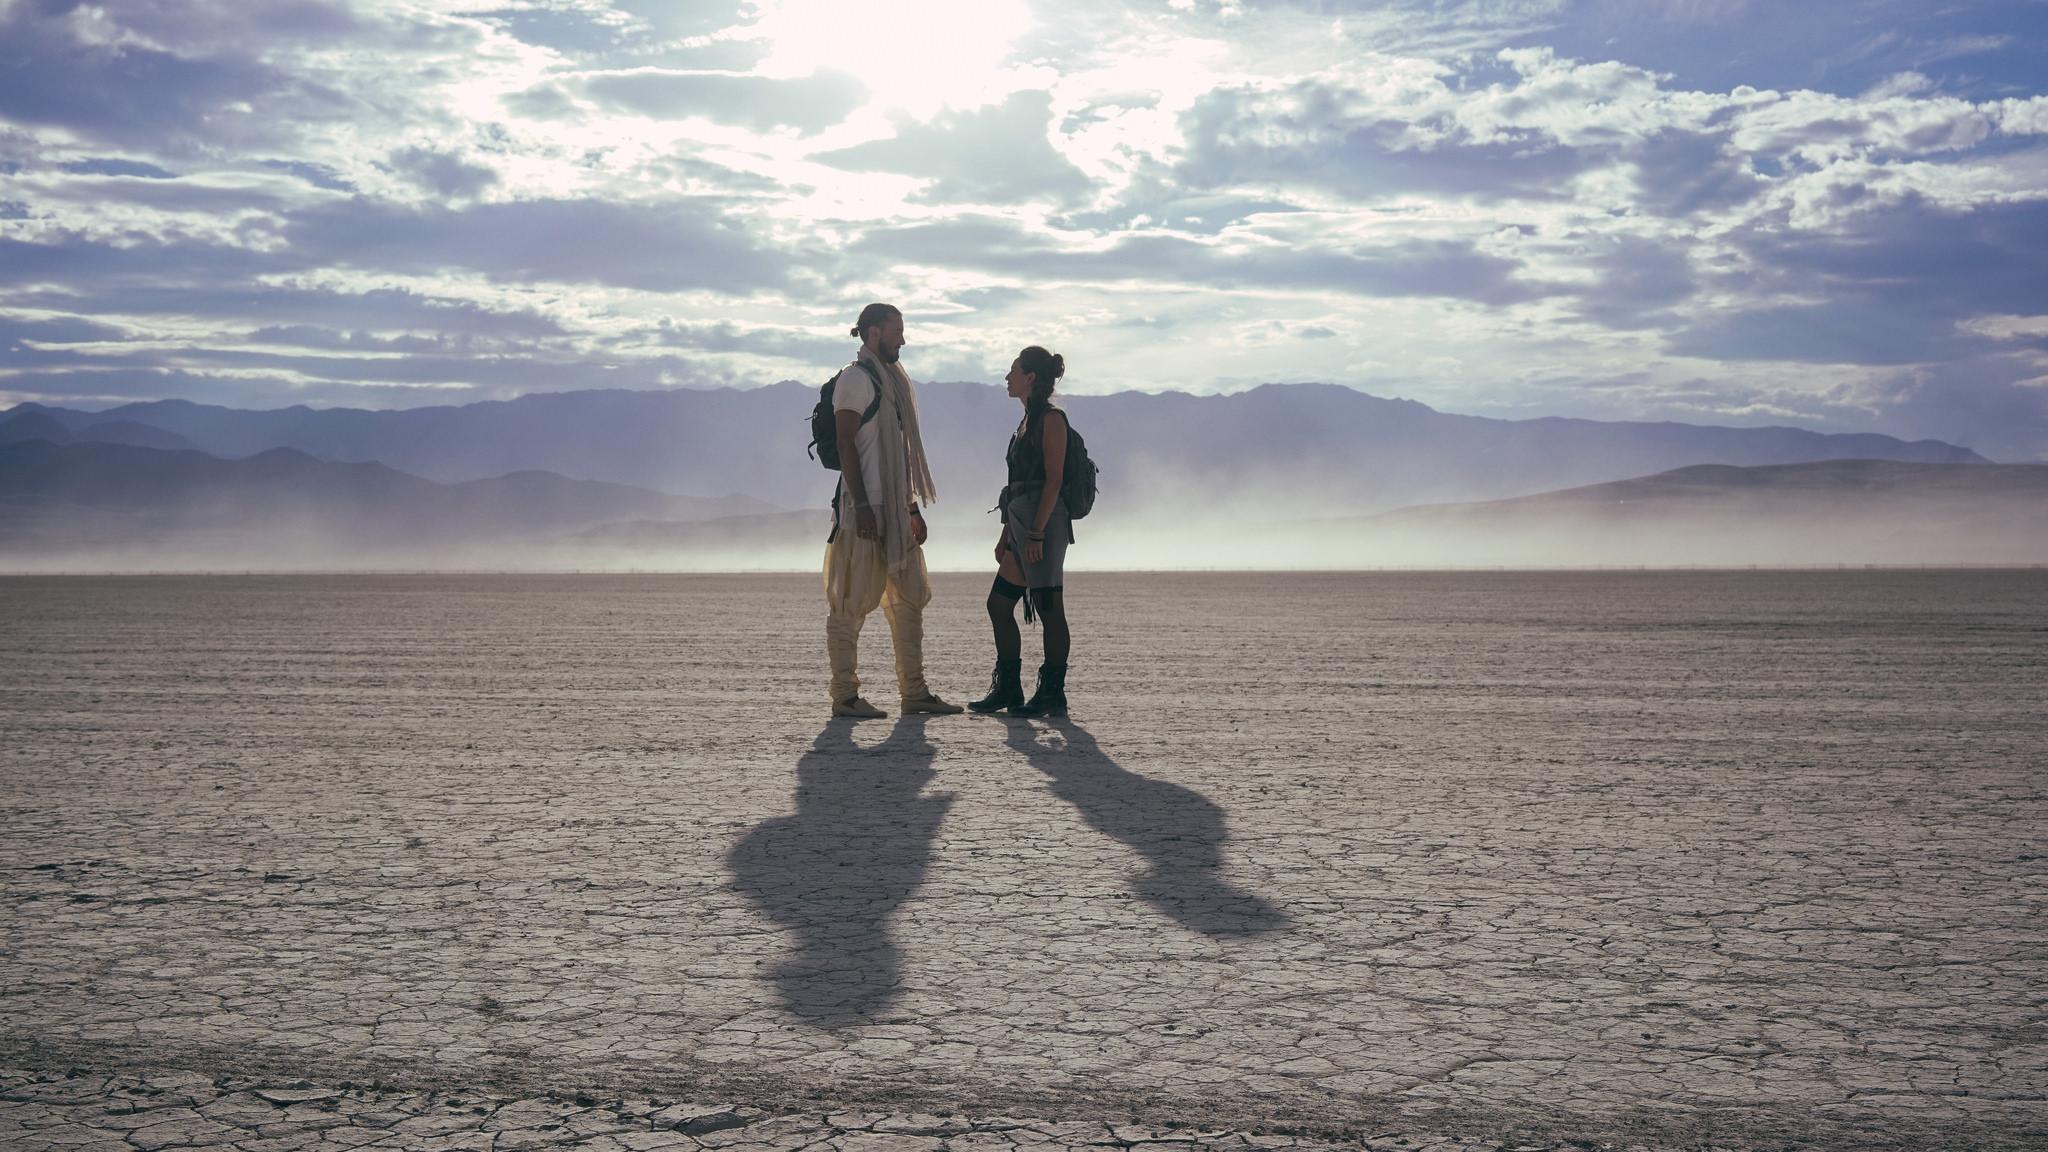 Burning Man 2016 // shot by Ben Henretig